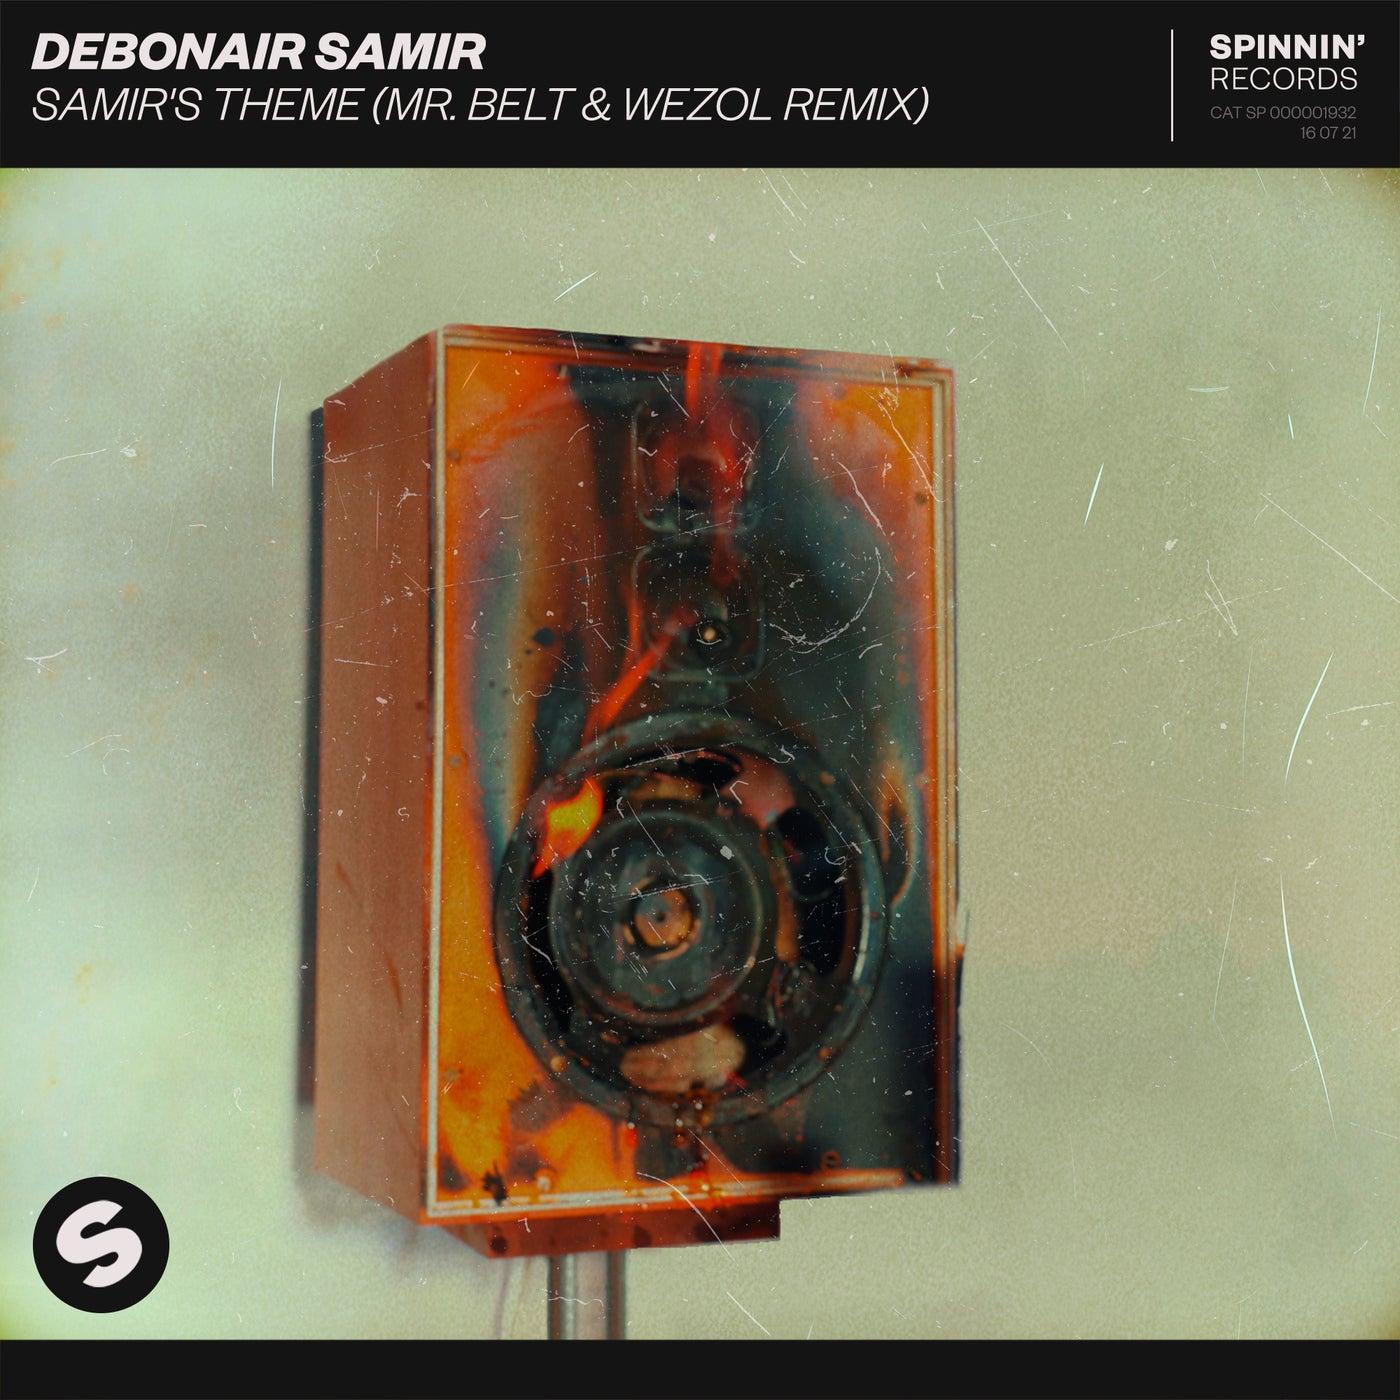 Samir's Theme (Mr. Belt & Wezol Extended Remix)